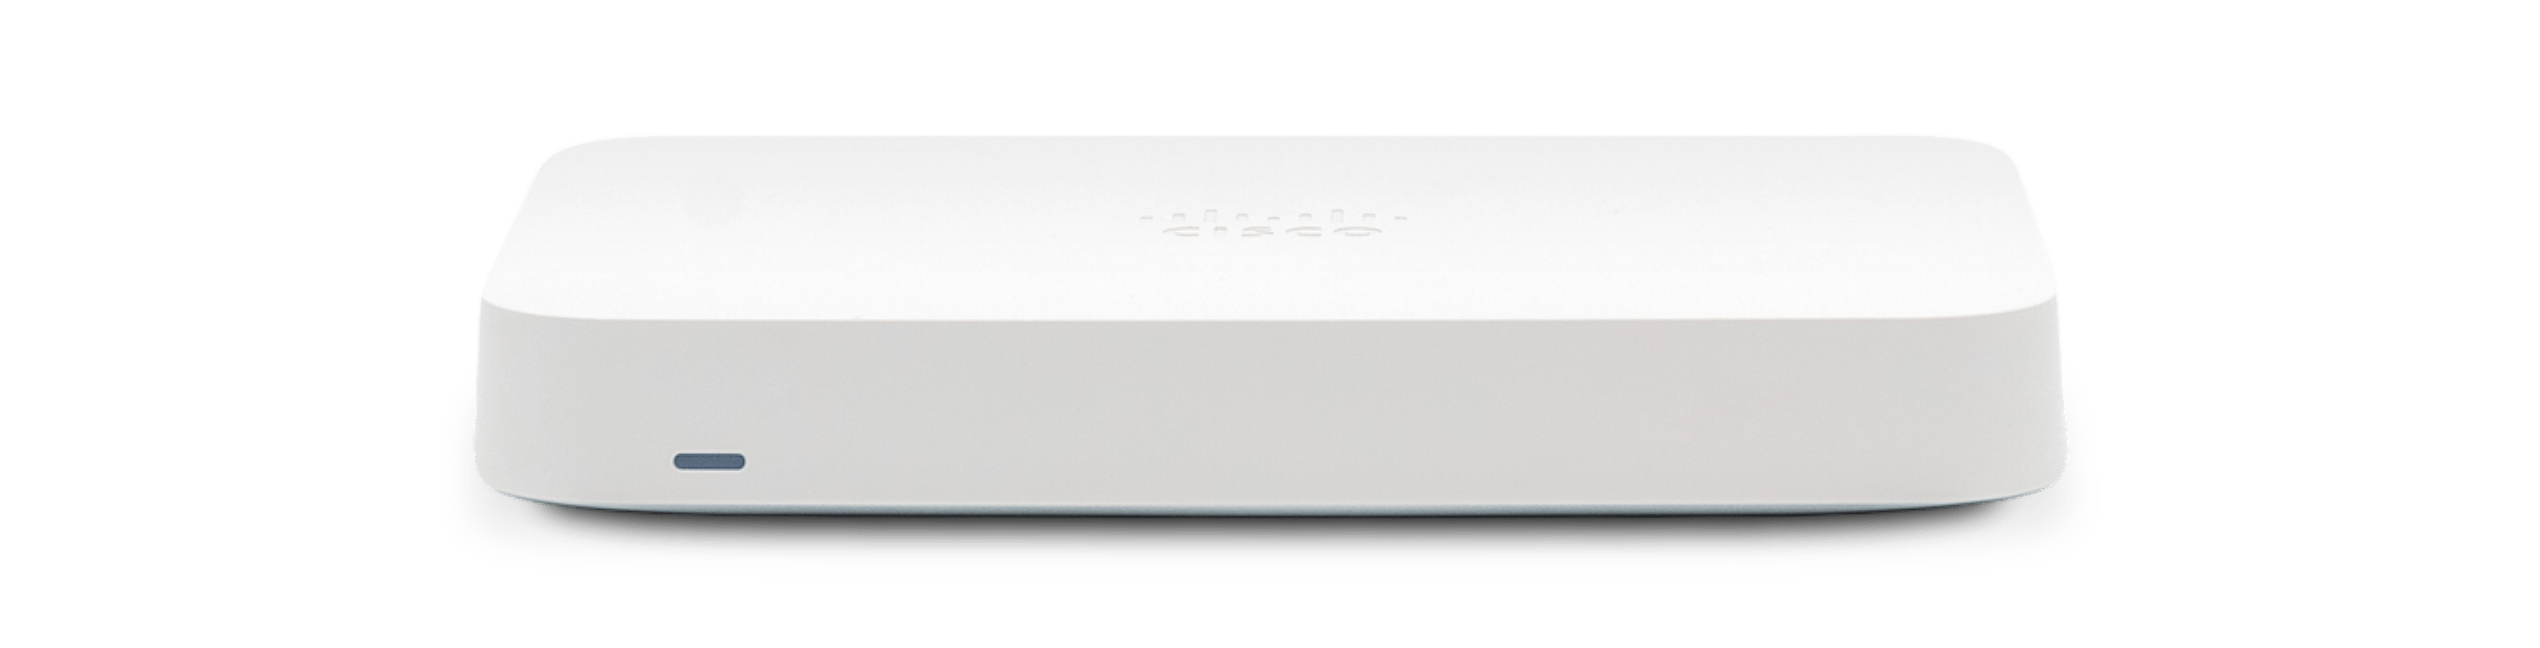 Meraki Go Security Gateway Firewall and Router